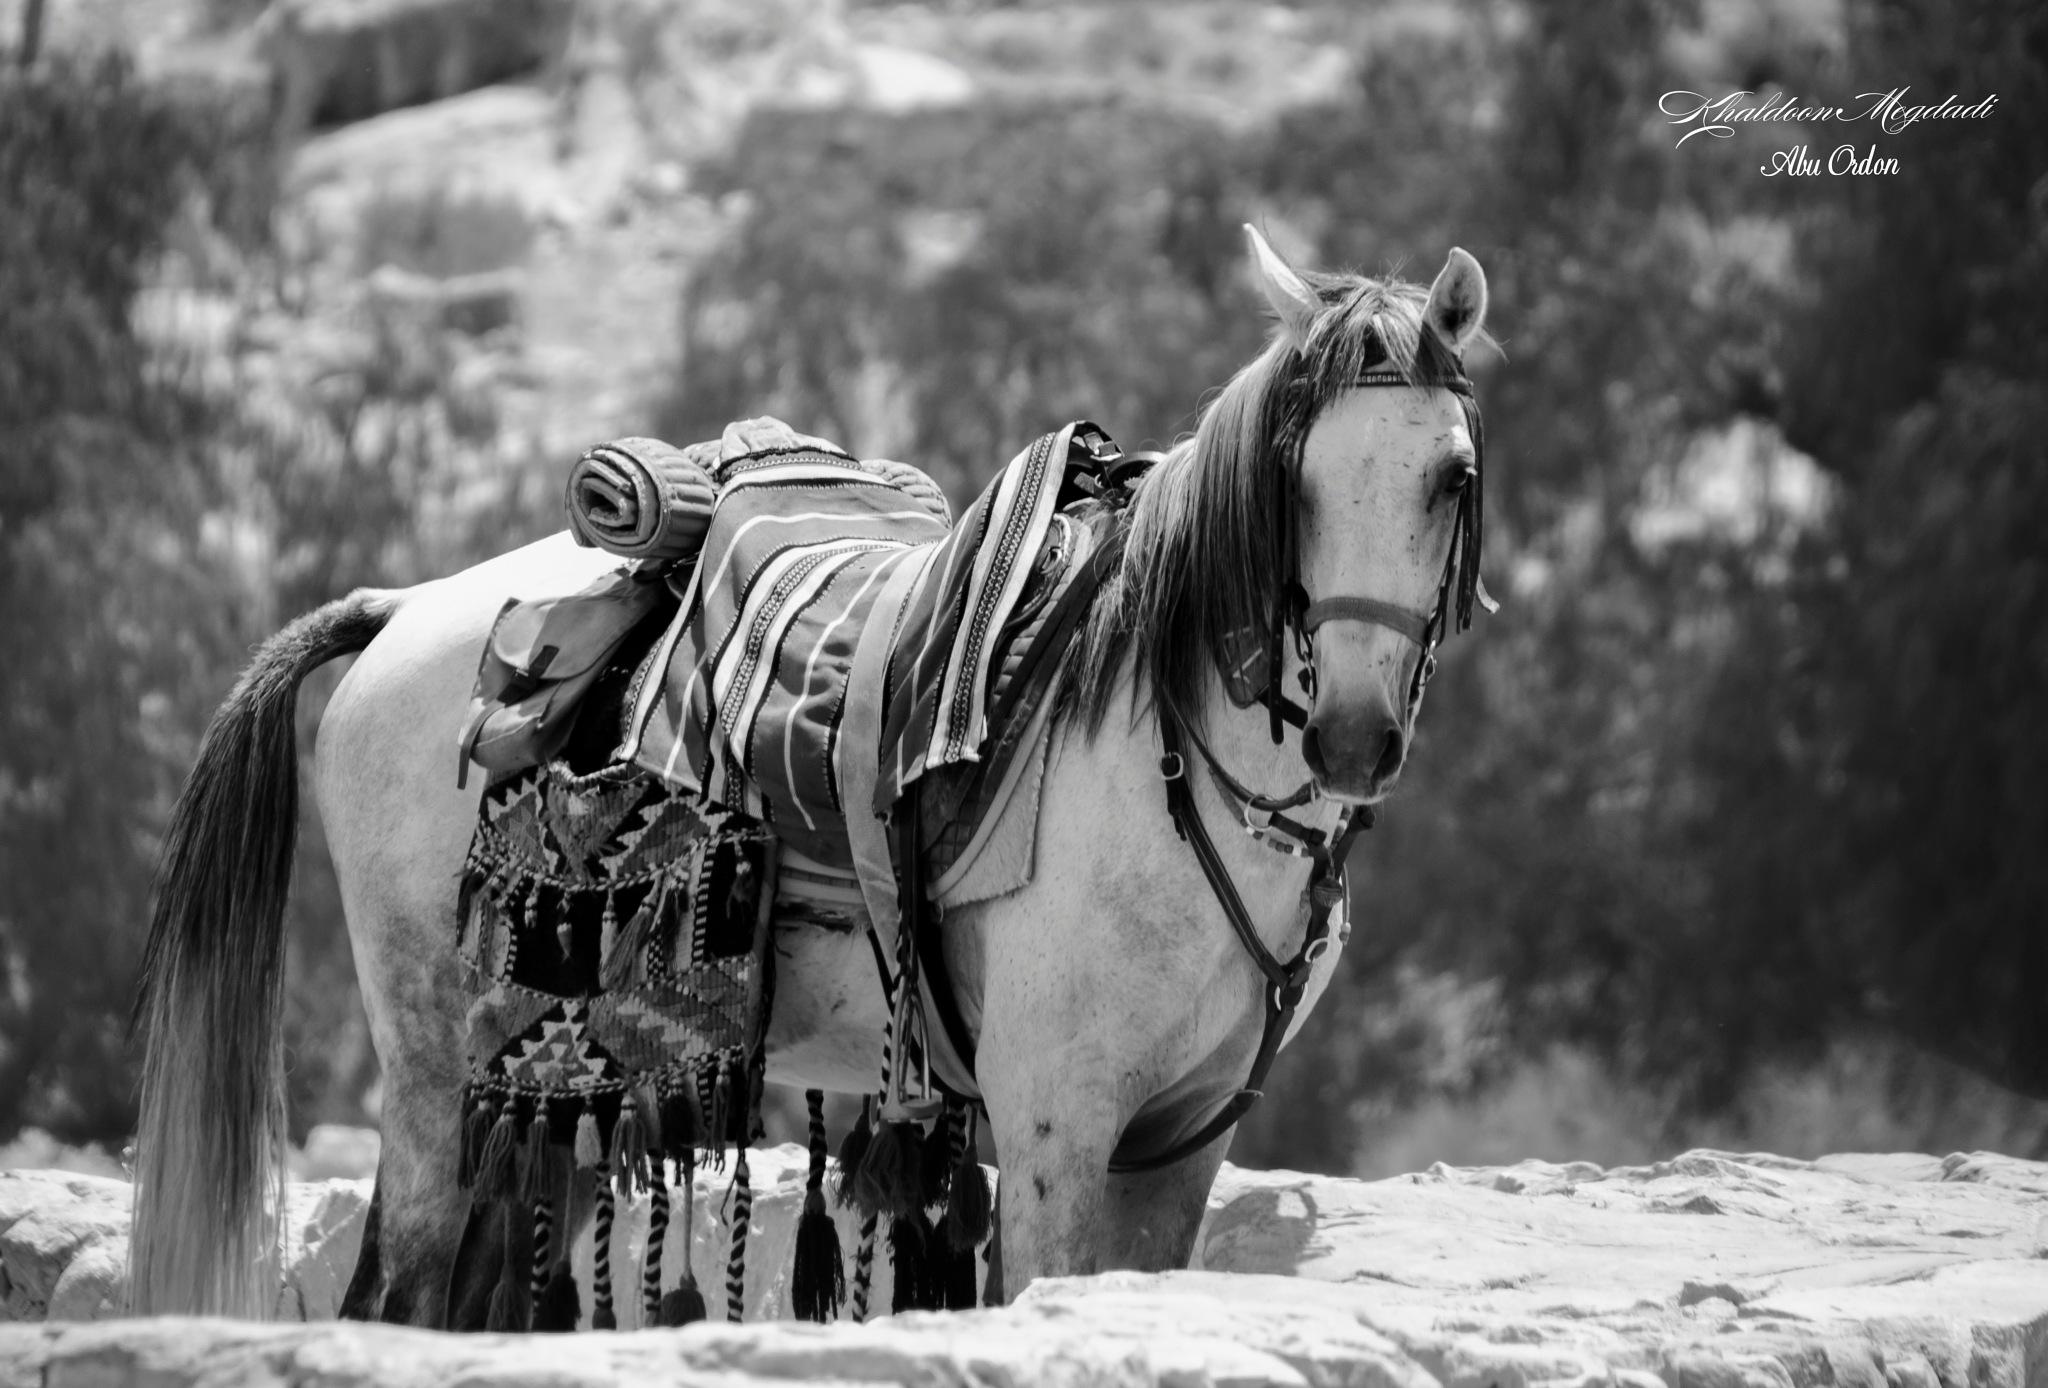 a horse by Abu Ordon